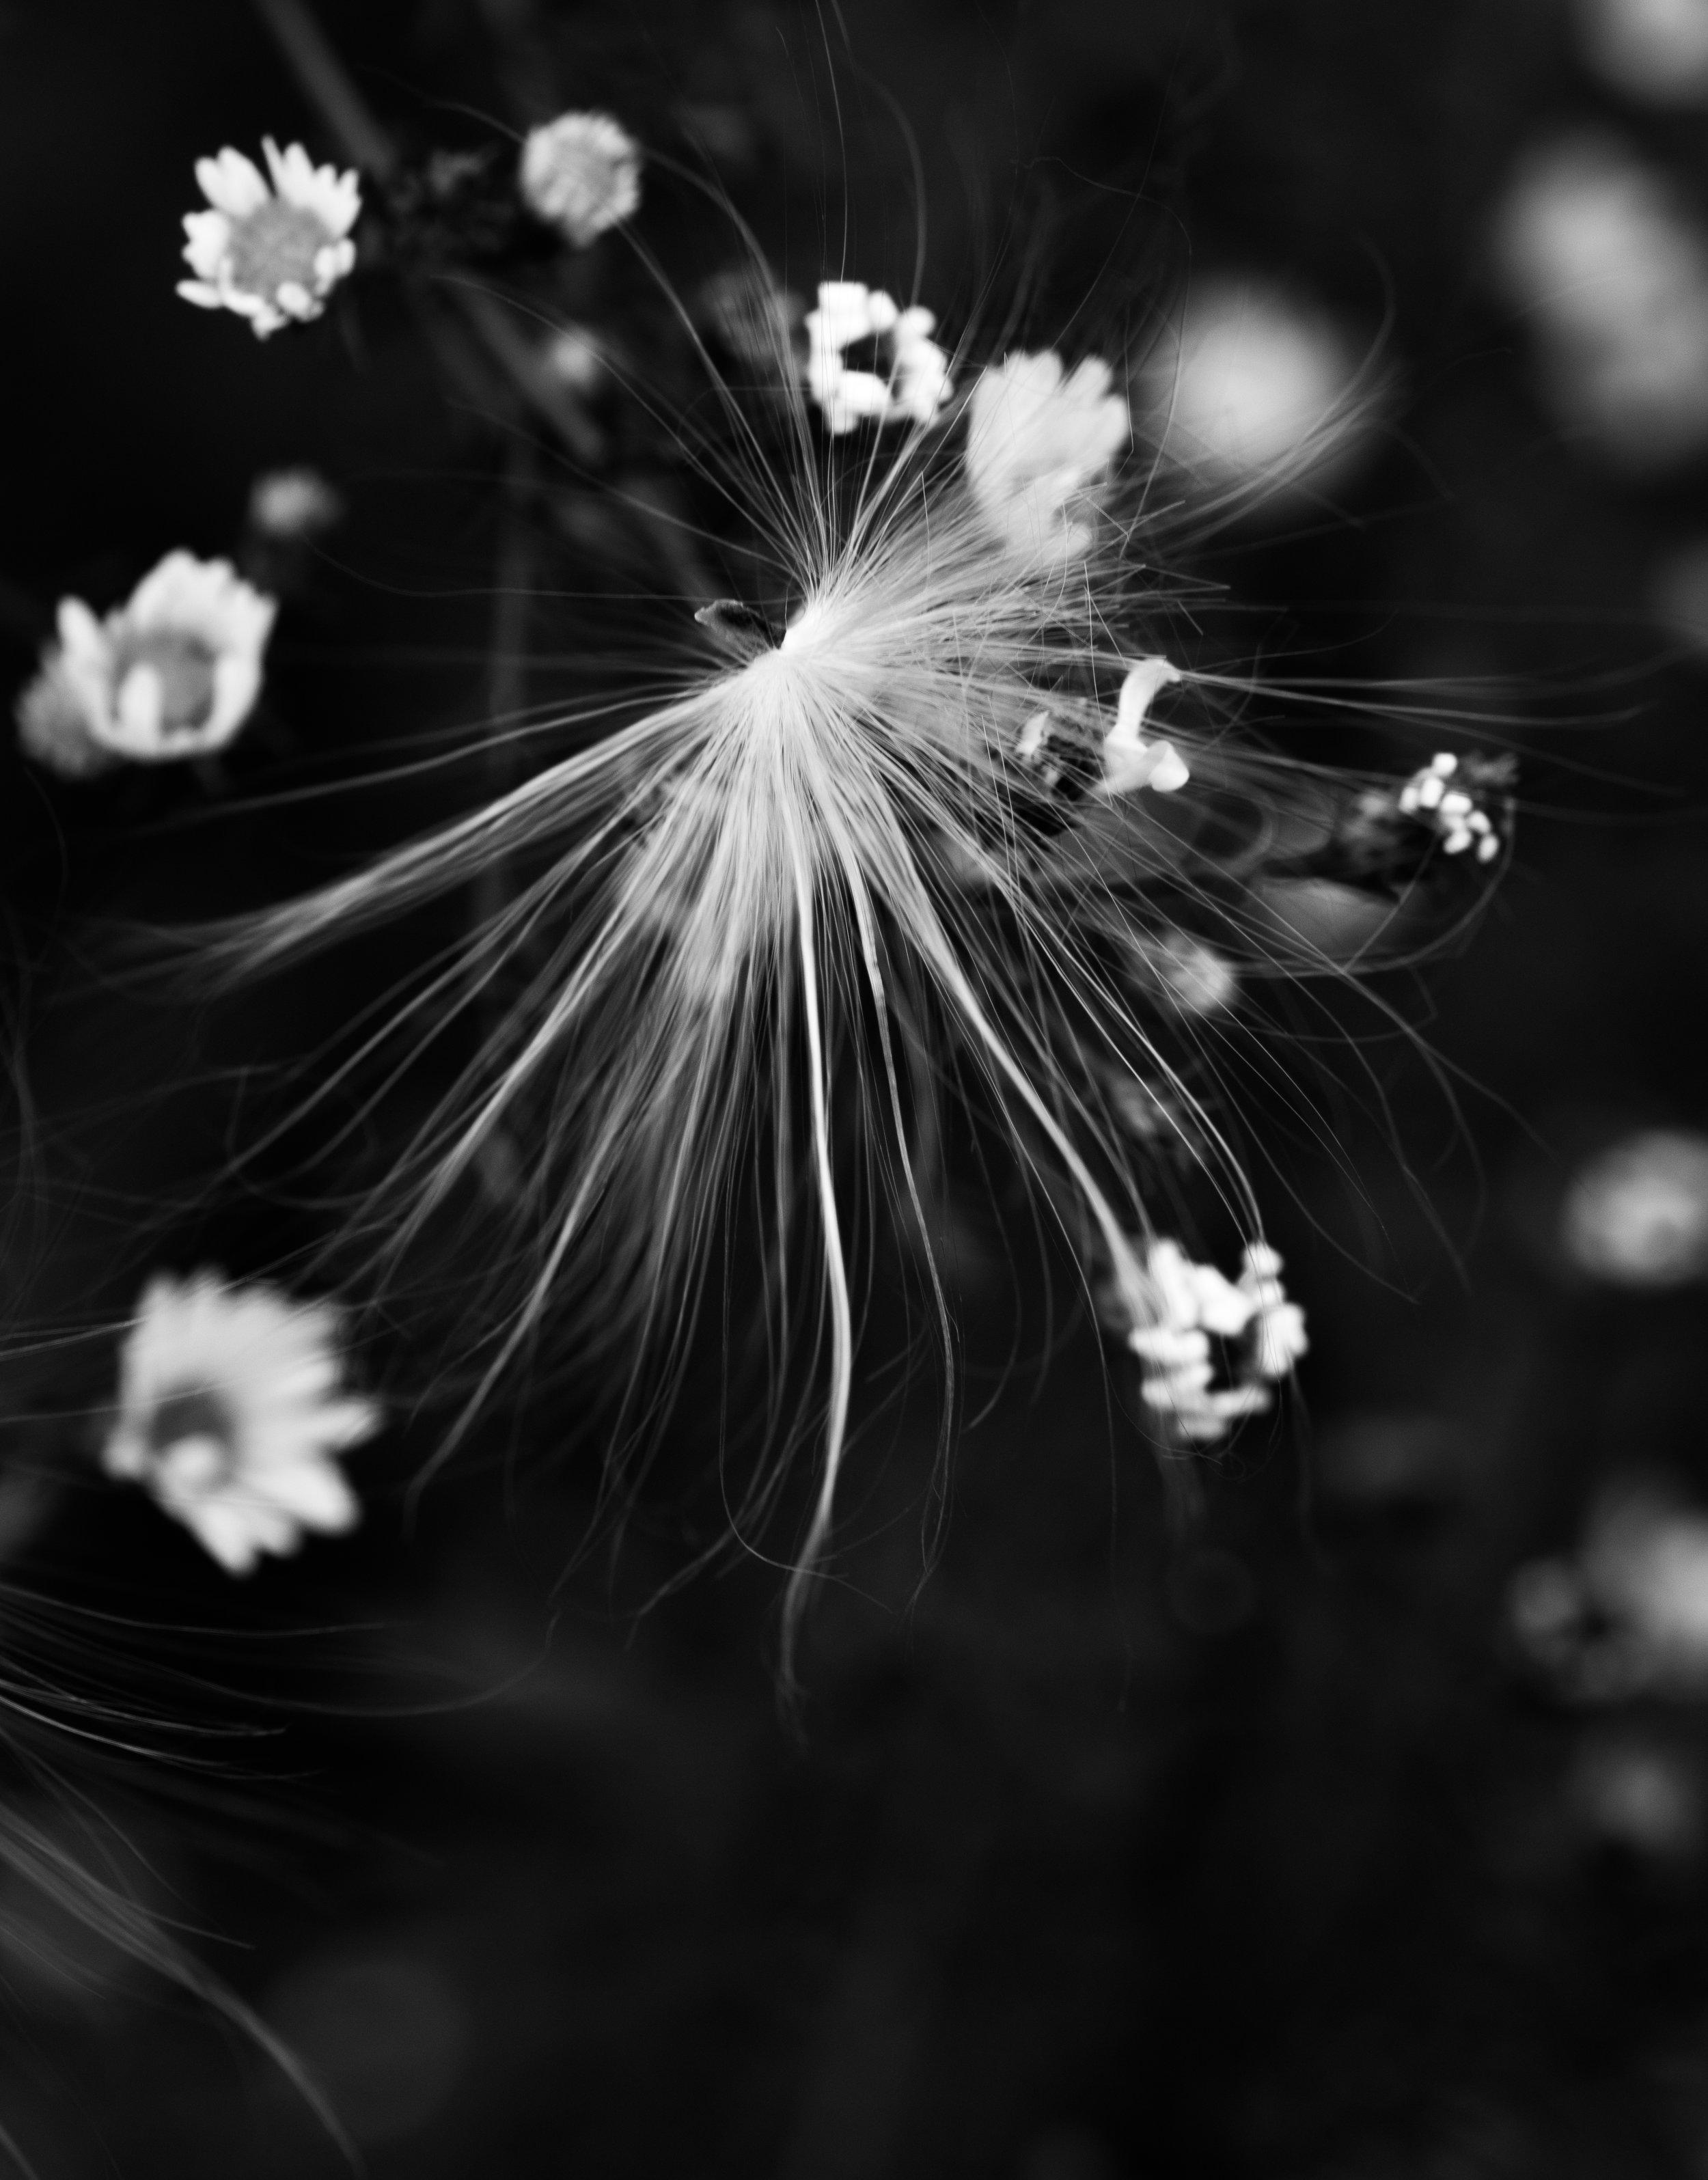 milkweed_small_buds.jpg